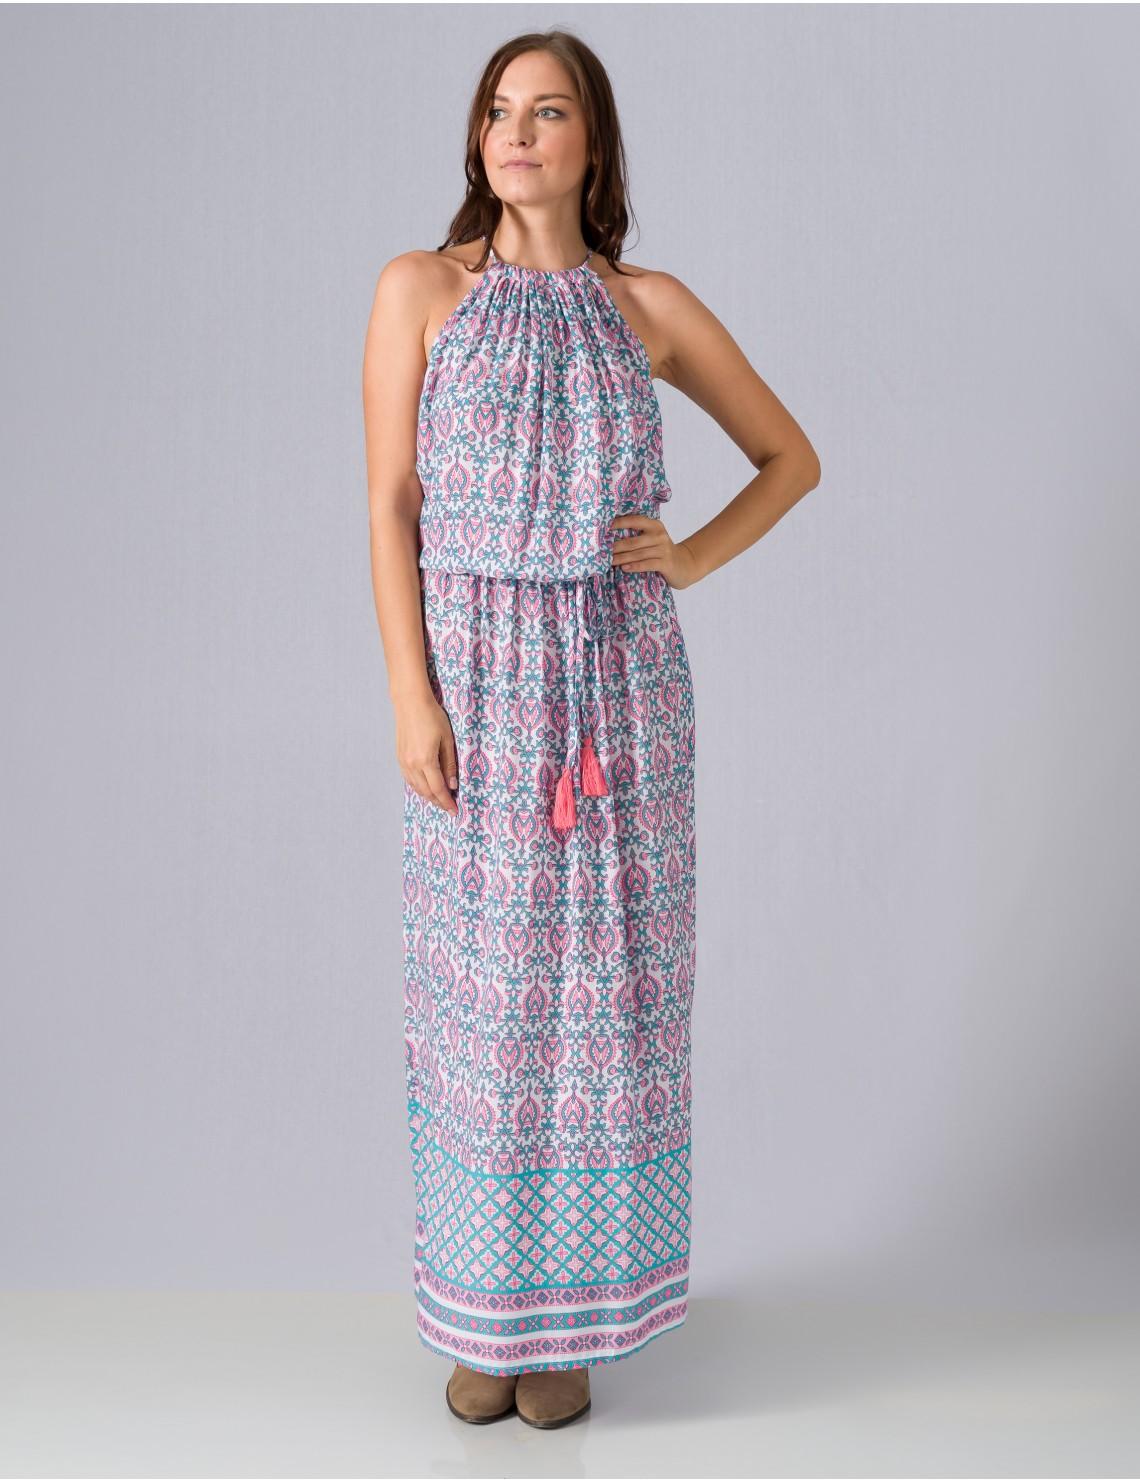 Kaya Dress - Matala Turkish